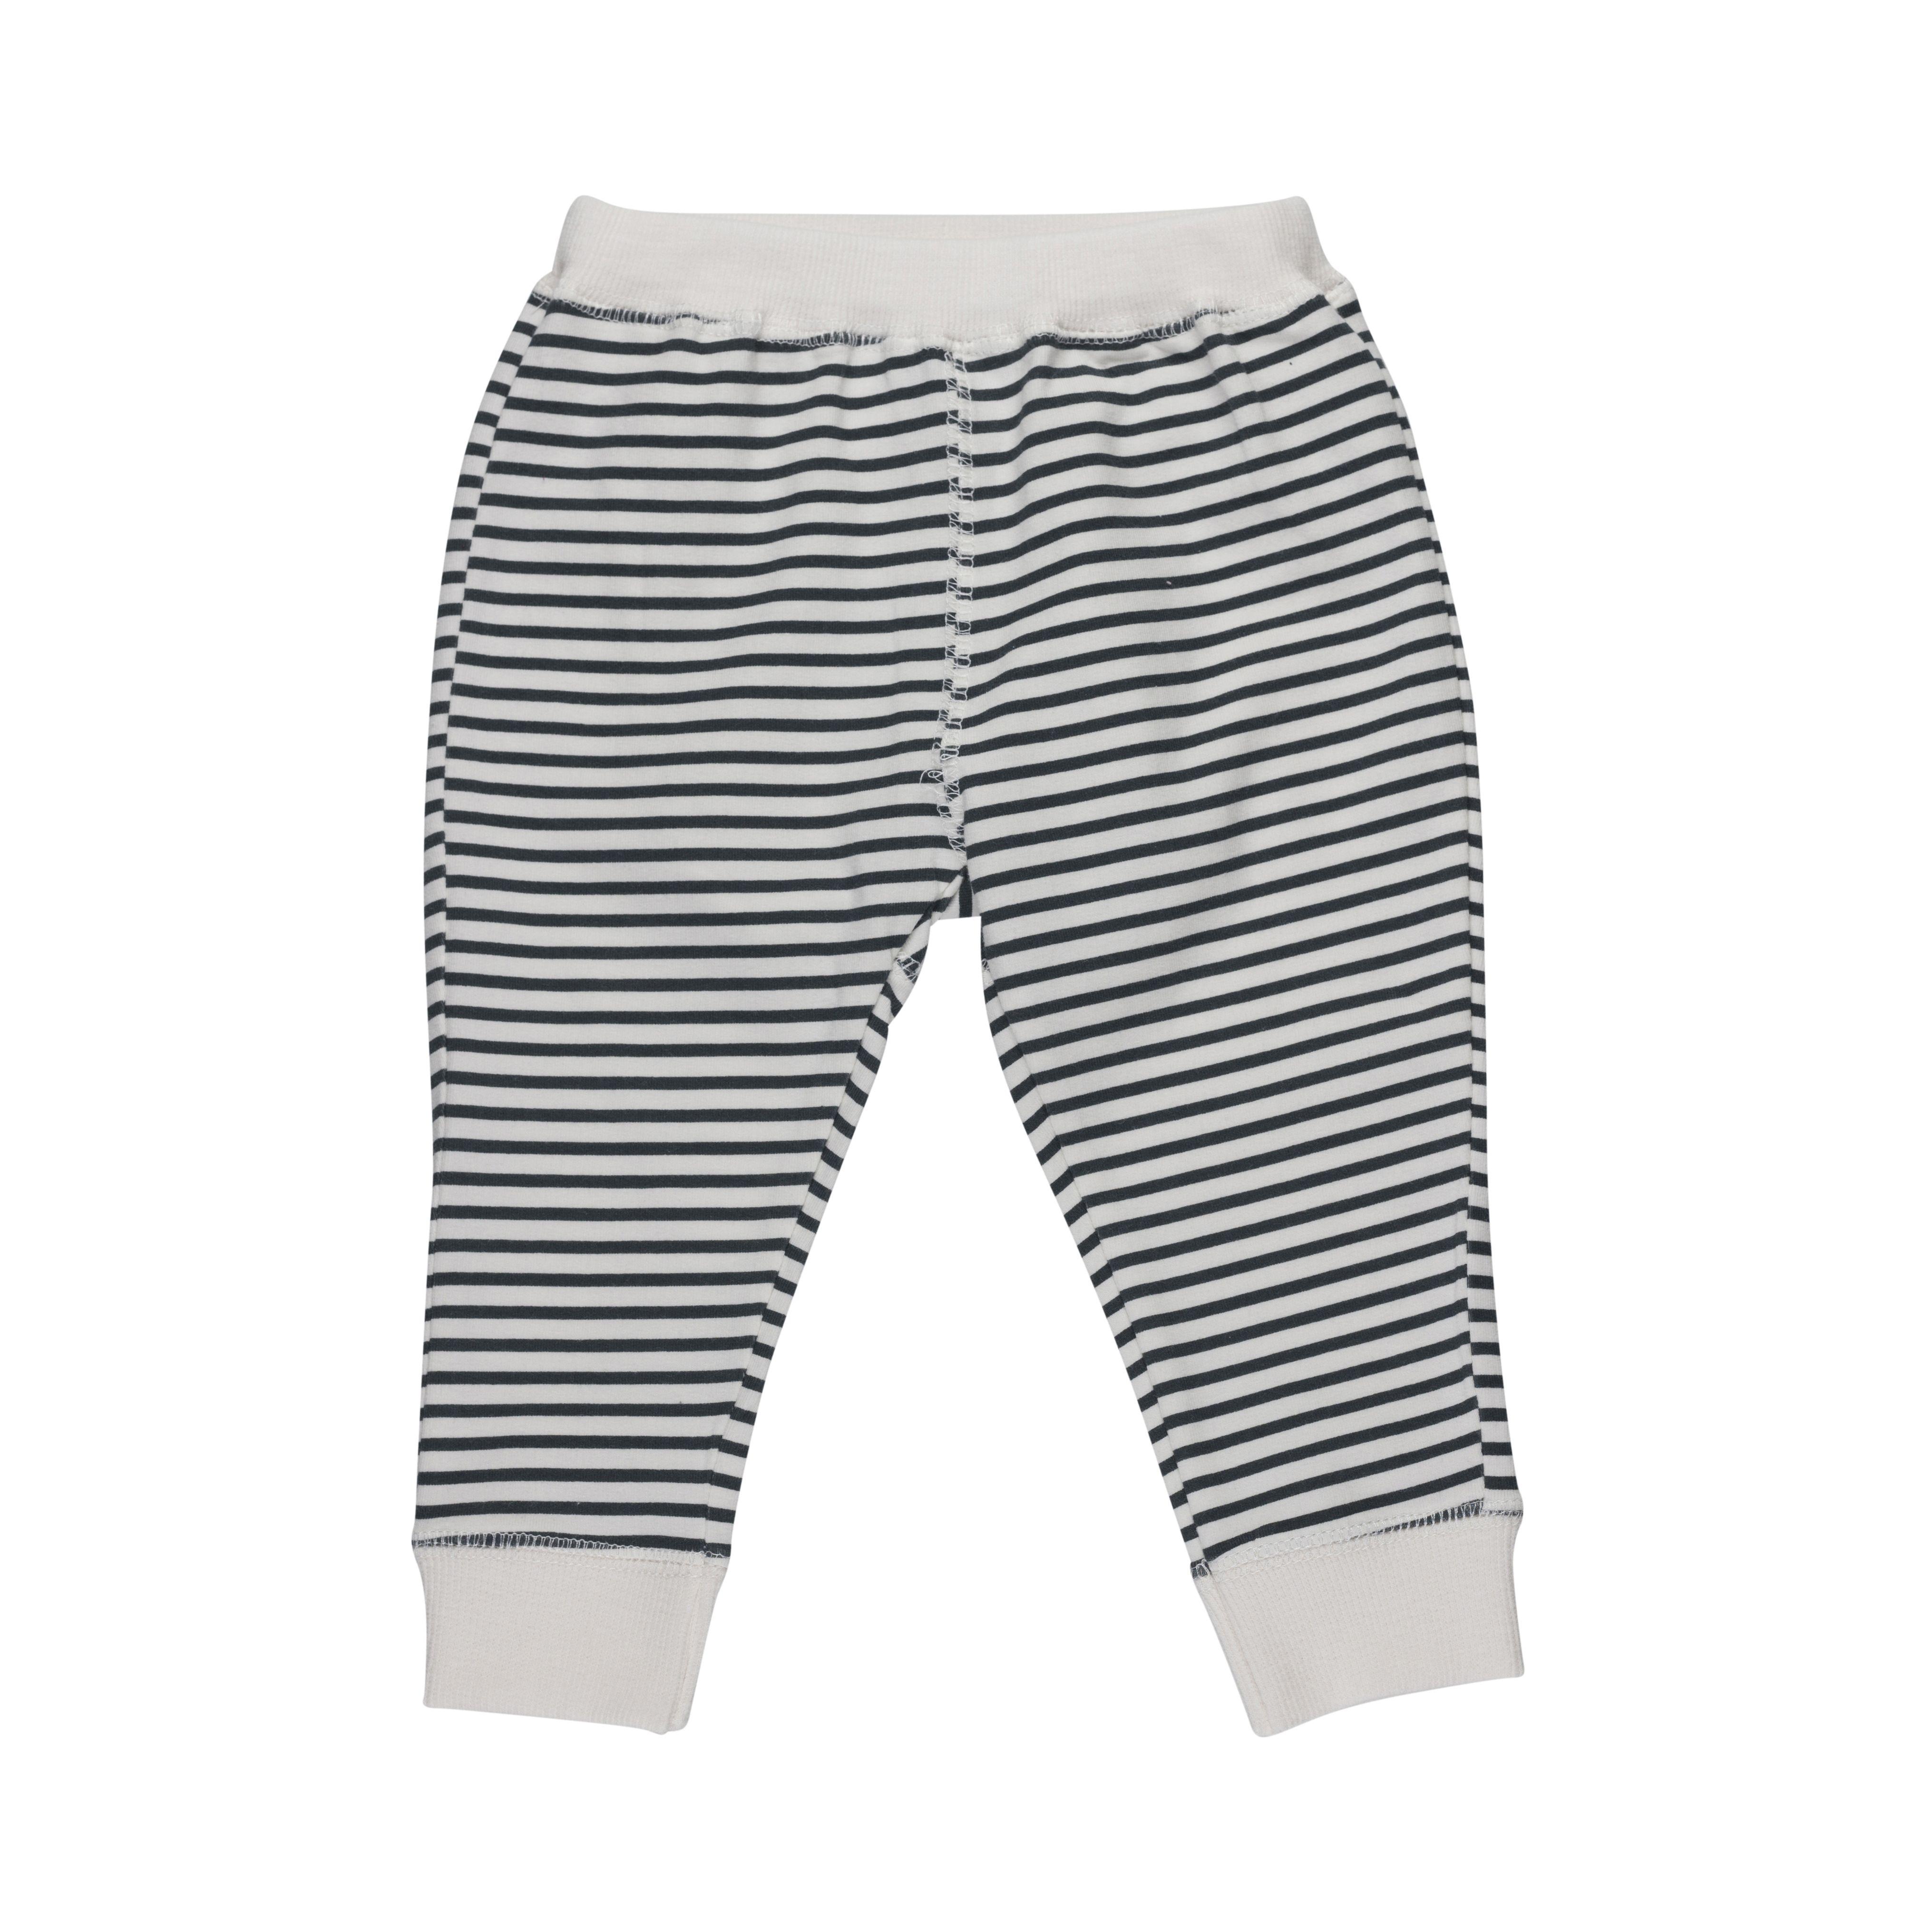 Image of Baby bukser fra Pippi - Økologisk Bomuld - Black Stripes (4021-100)